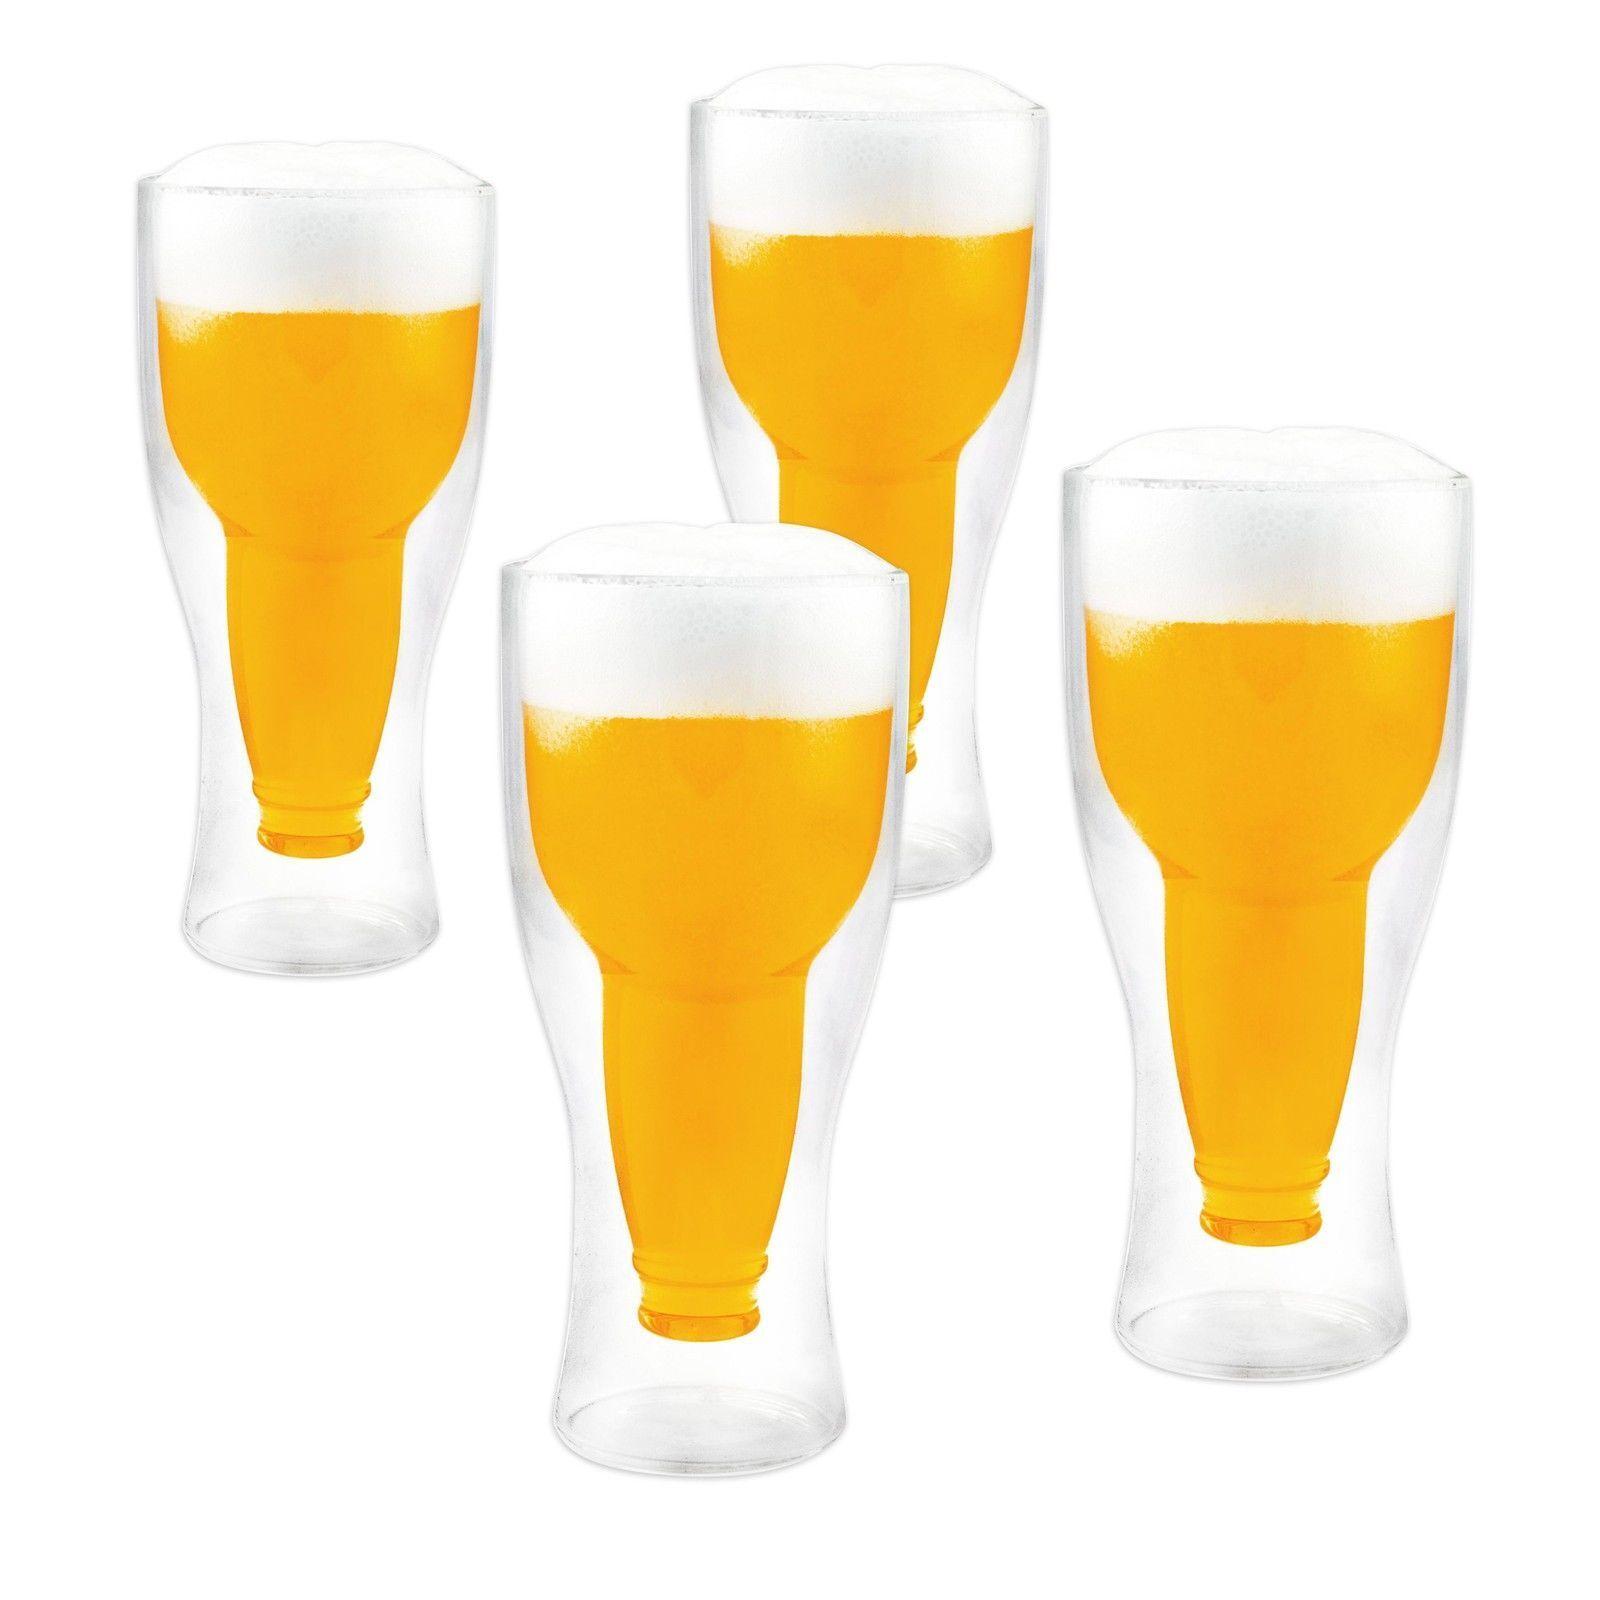 Thermo Biergläser Set 2 - 12-tlg Gläser doppelwandig Bierglas Kühles Bier